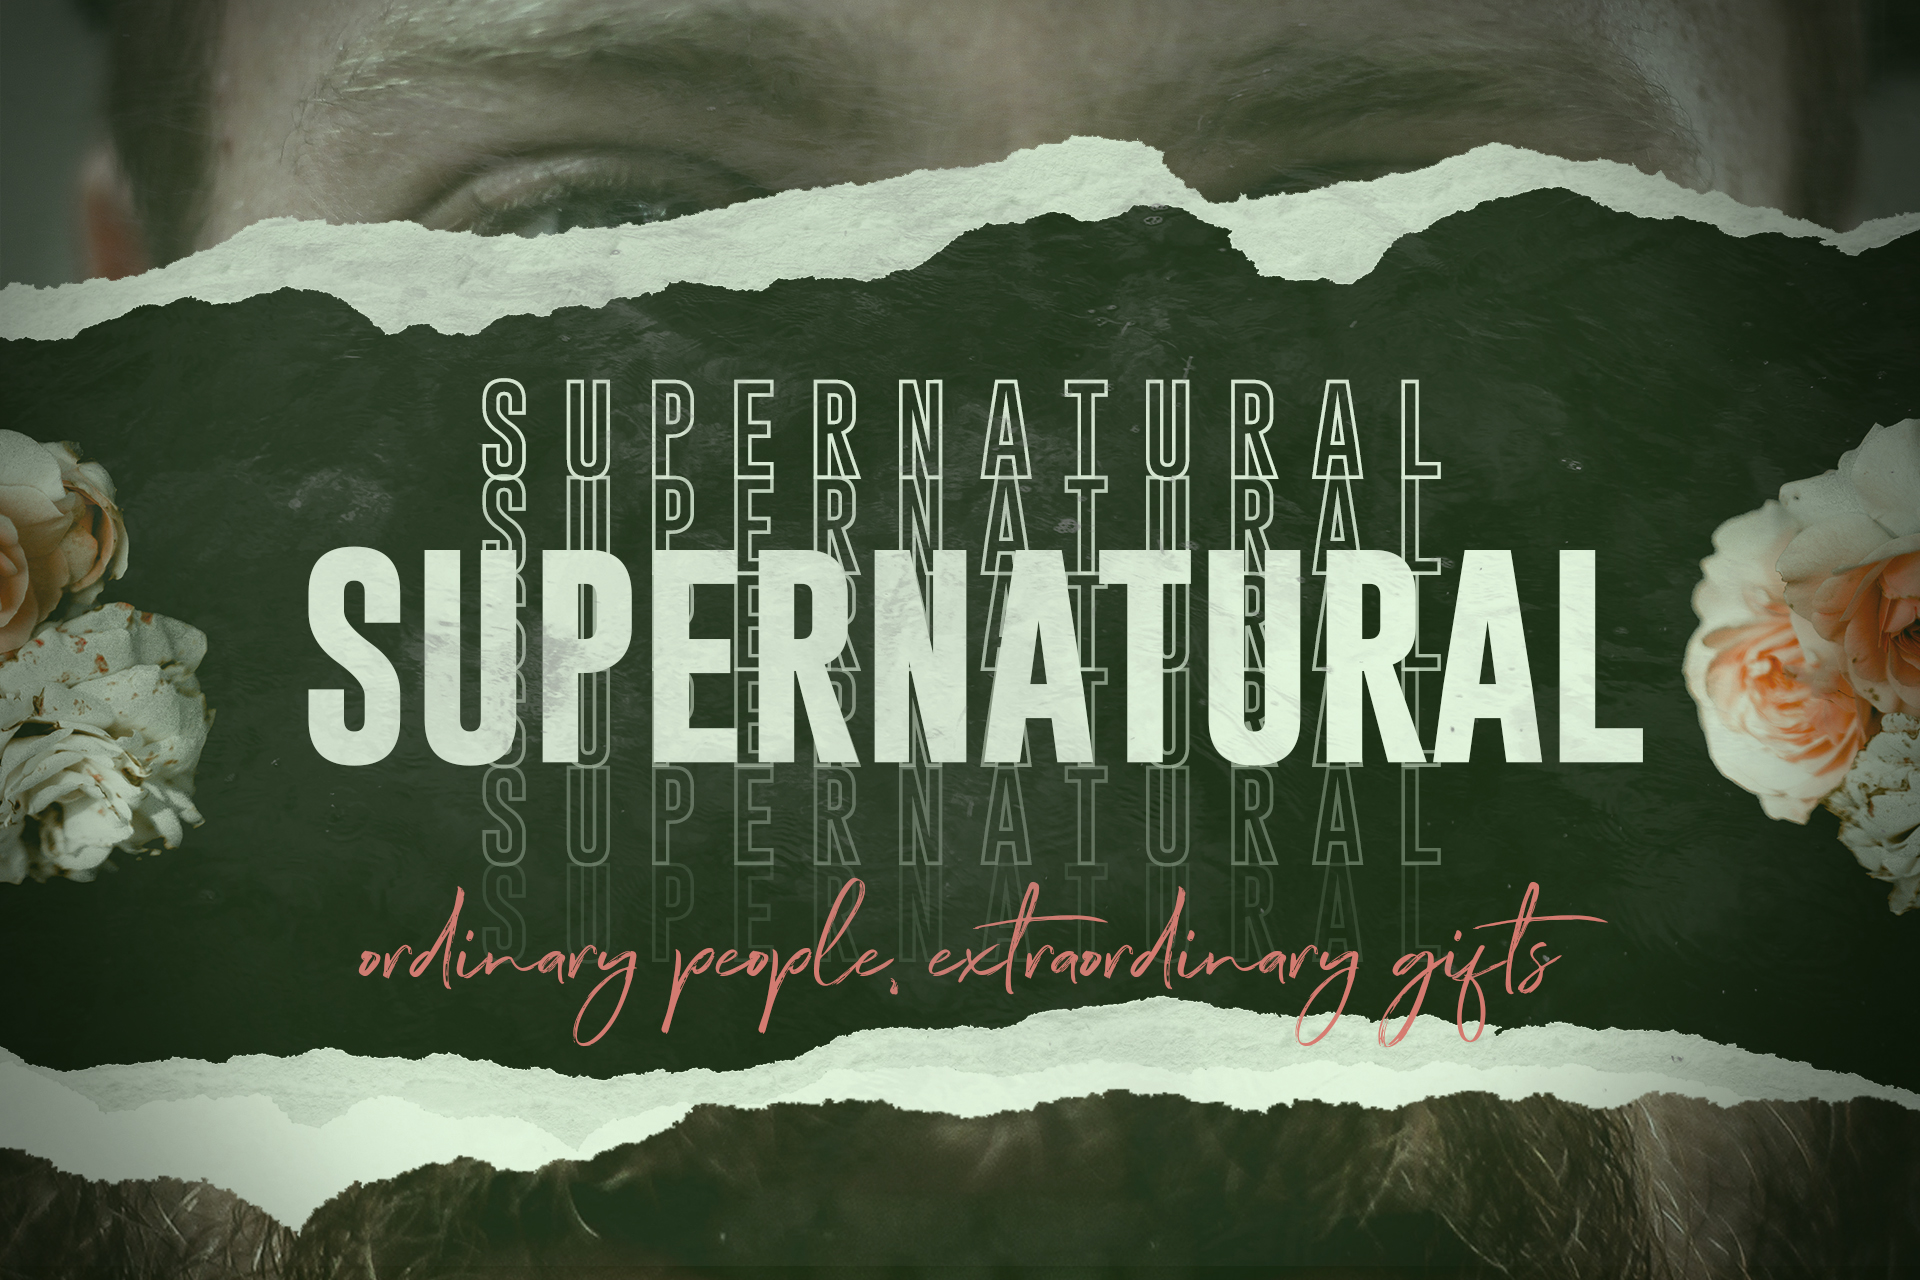 supernatural_title.jpg